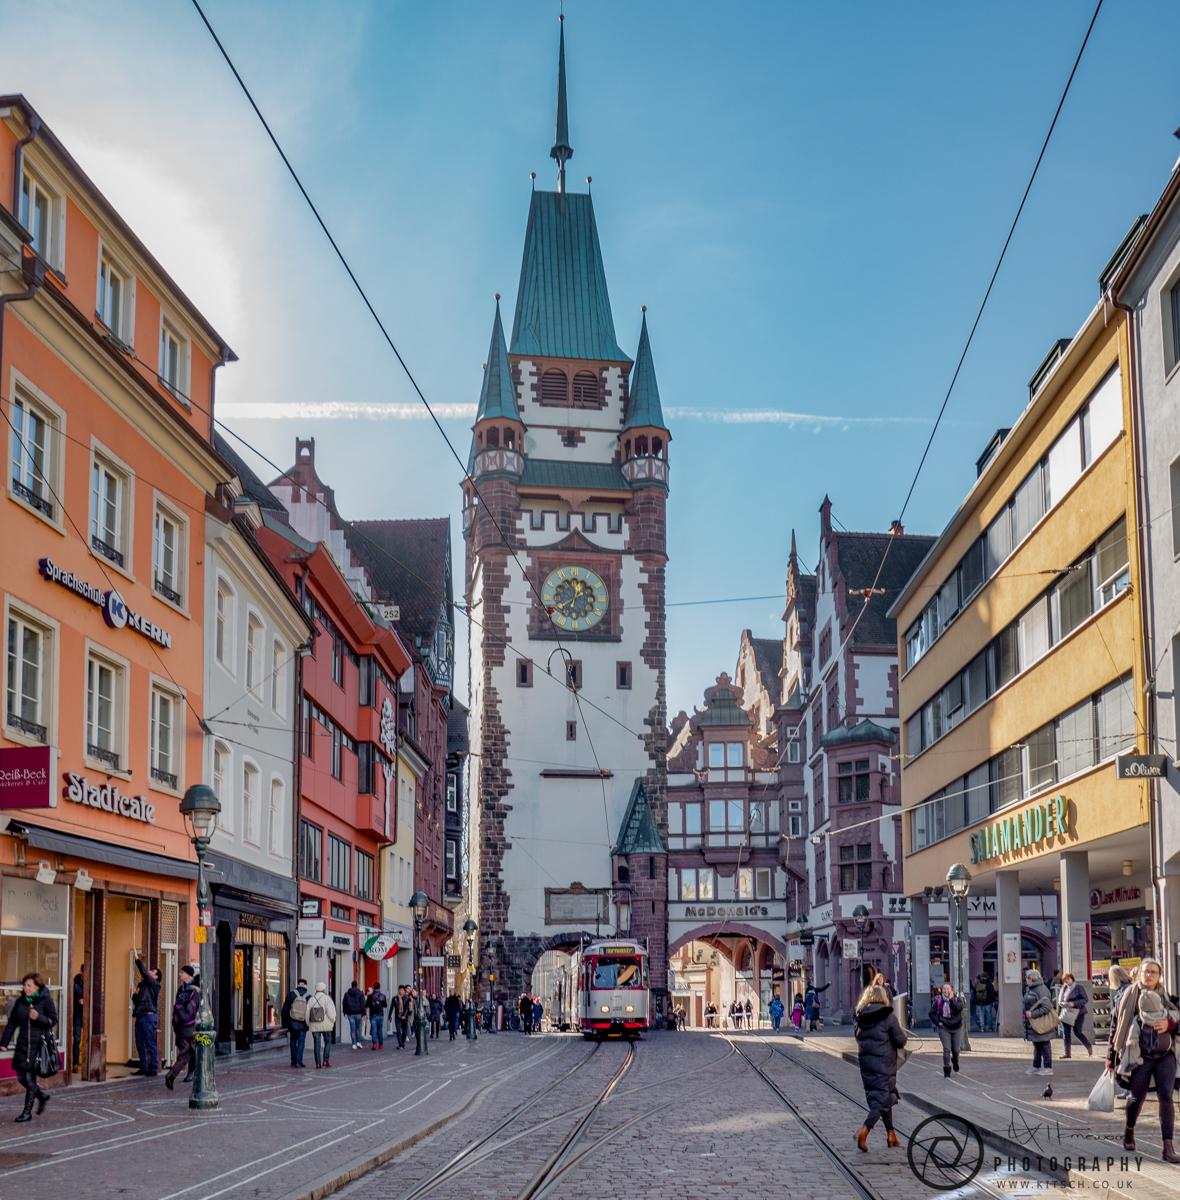 Freiburg Martinsor Gate